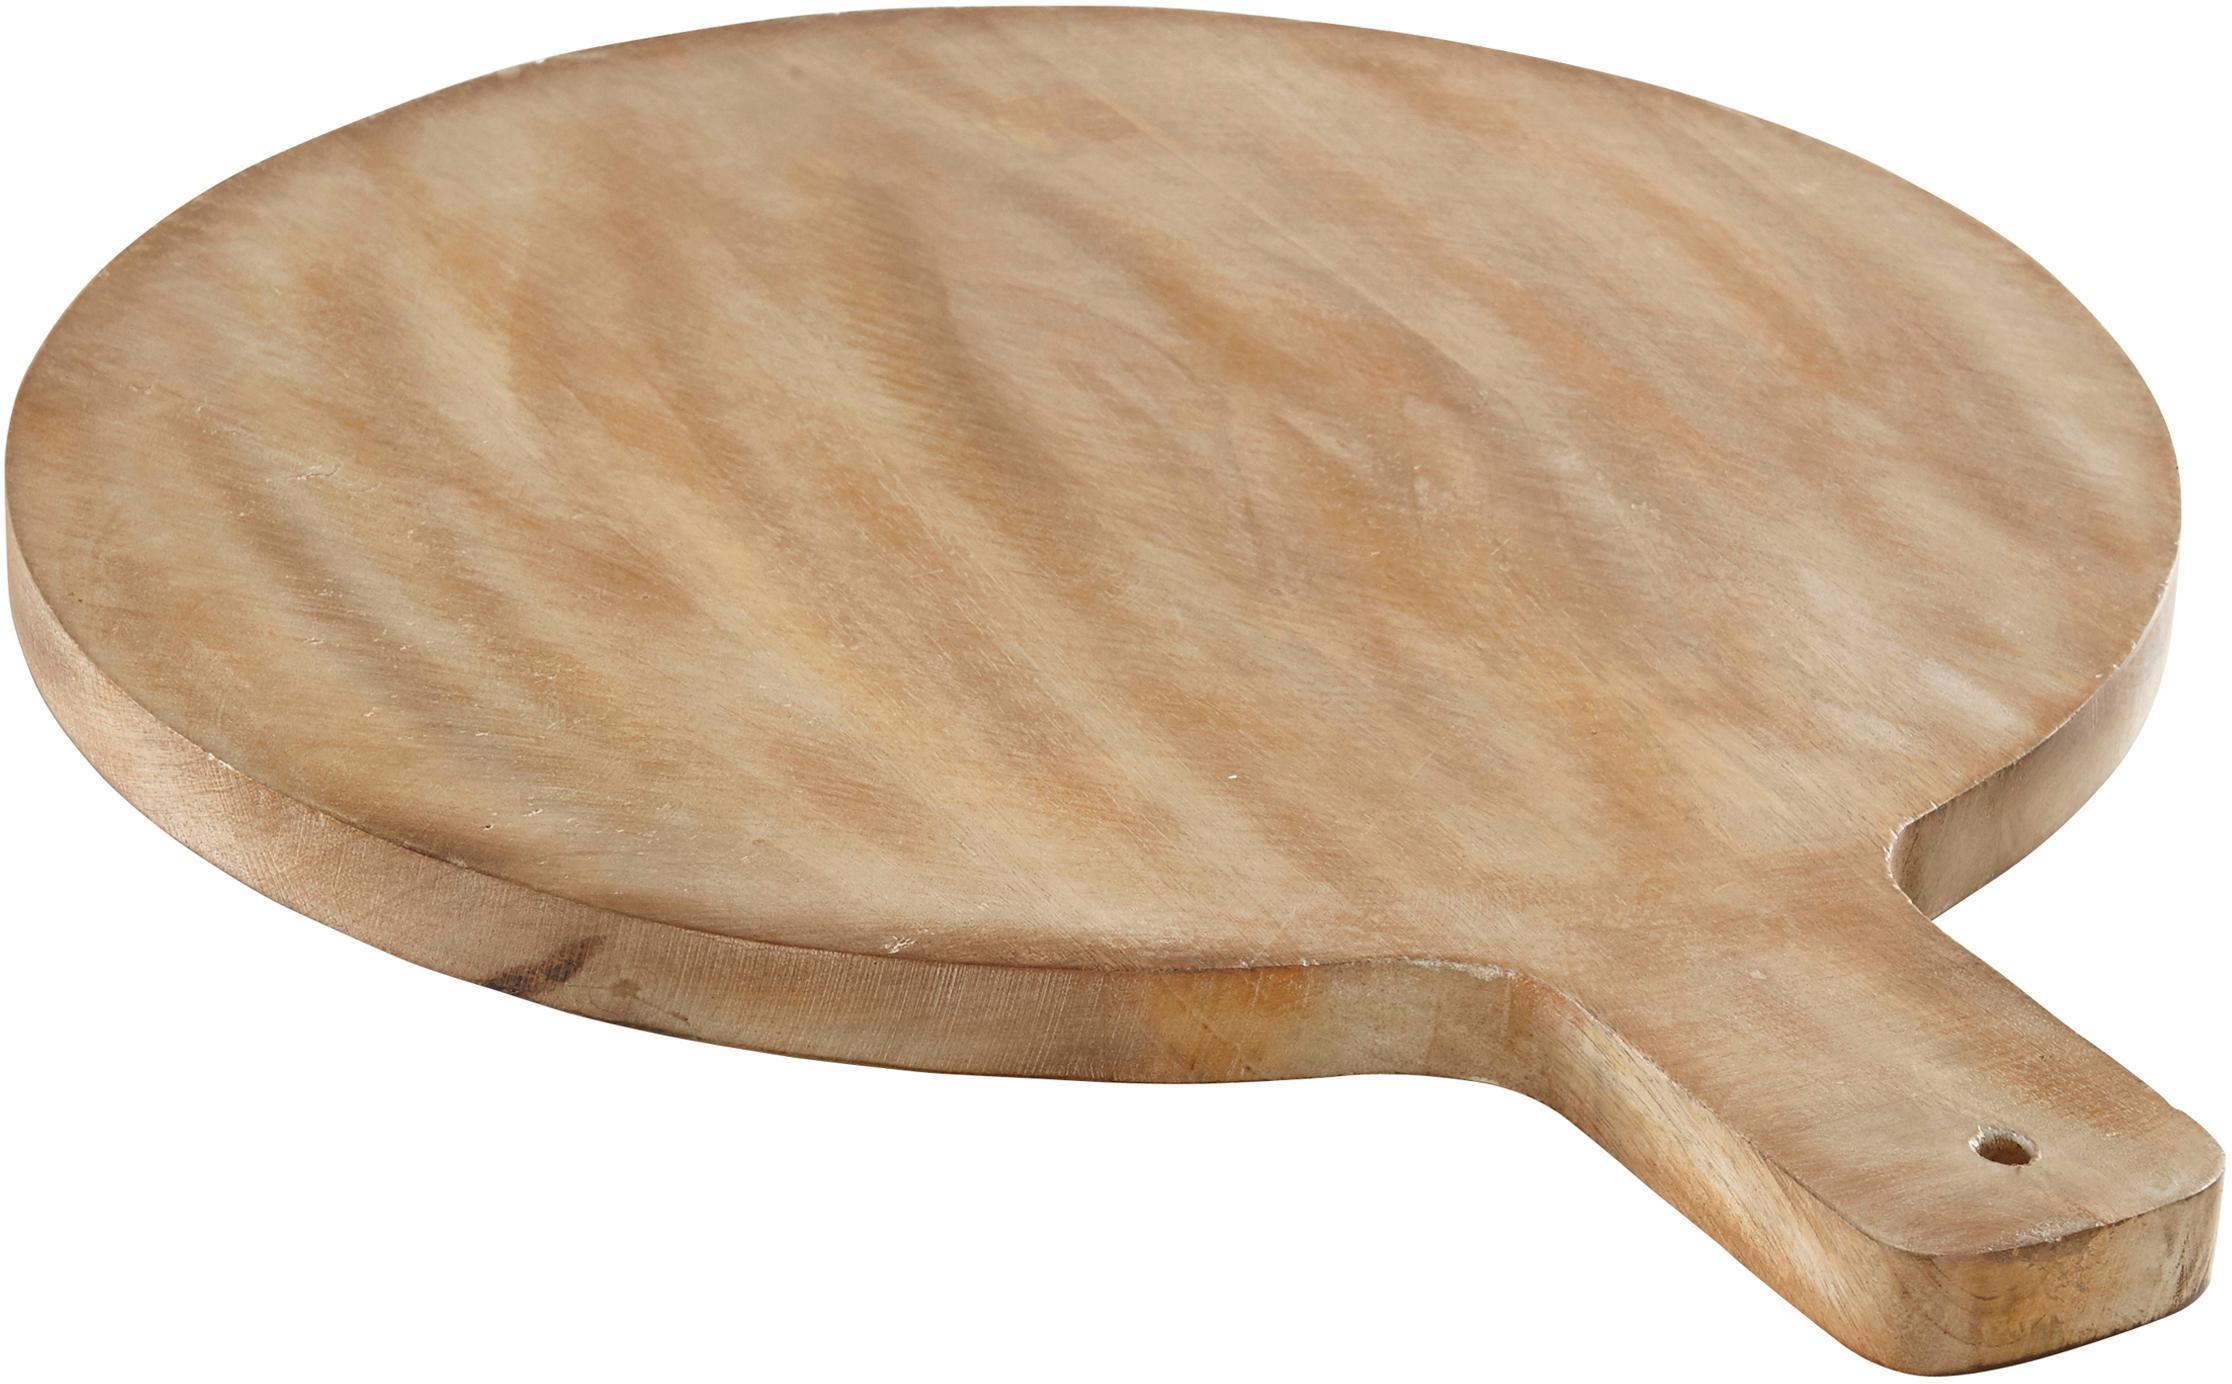 Tabla de cortar de madera Melker, Madera de acacia, Madera de acacia, An 58 x F 46 cm